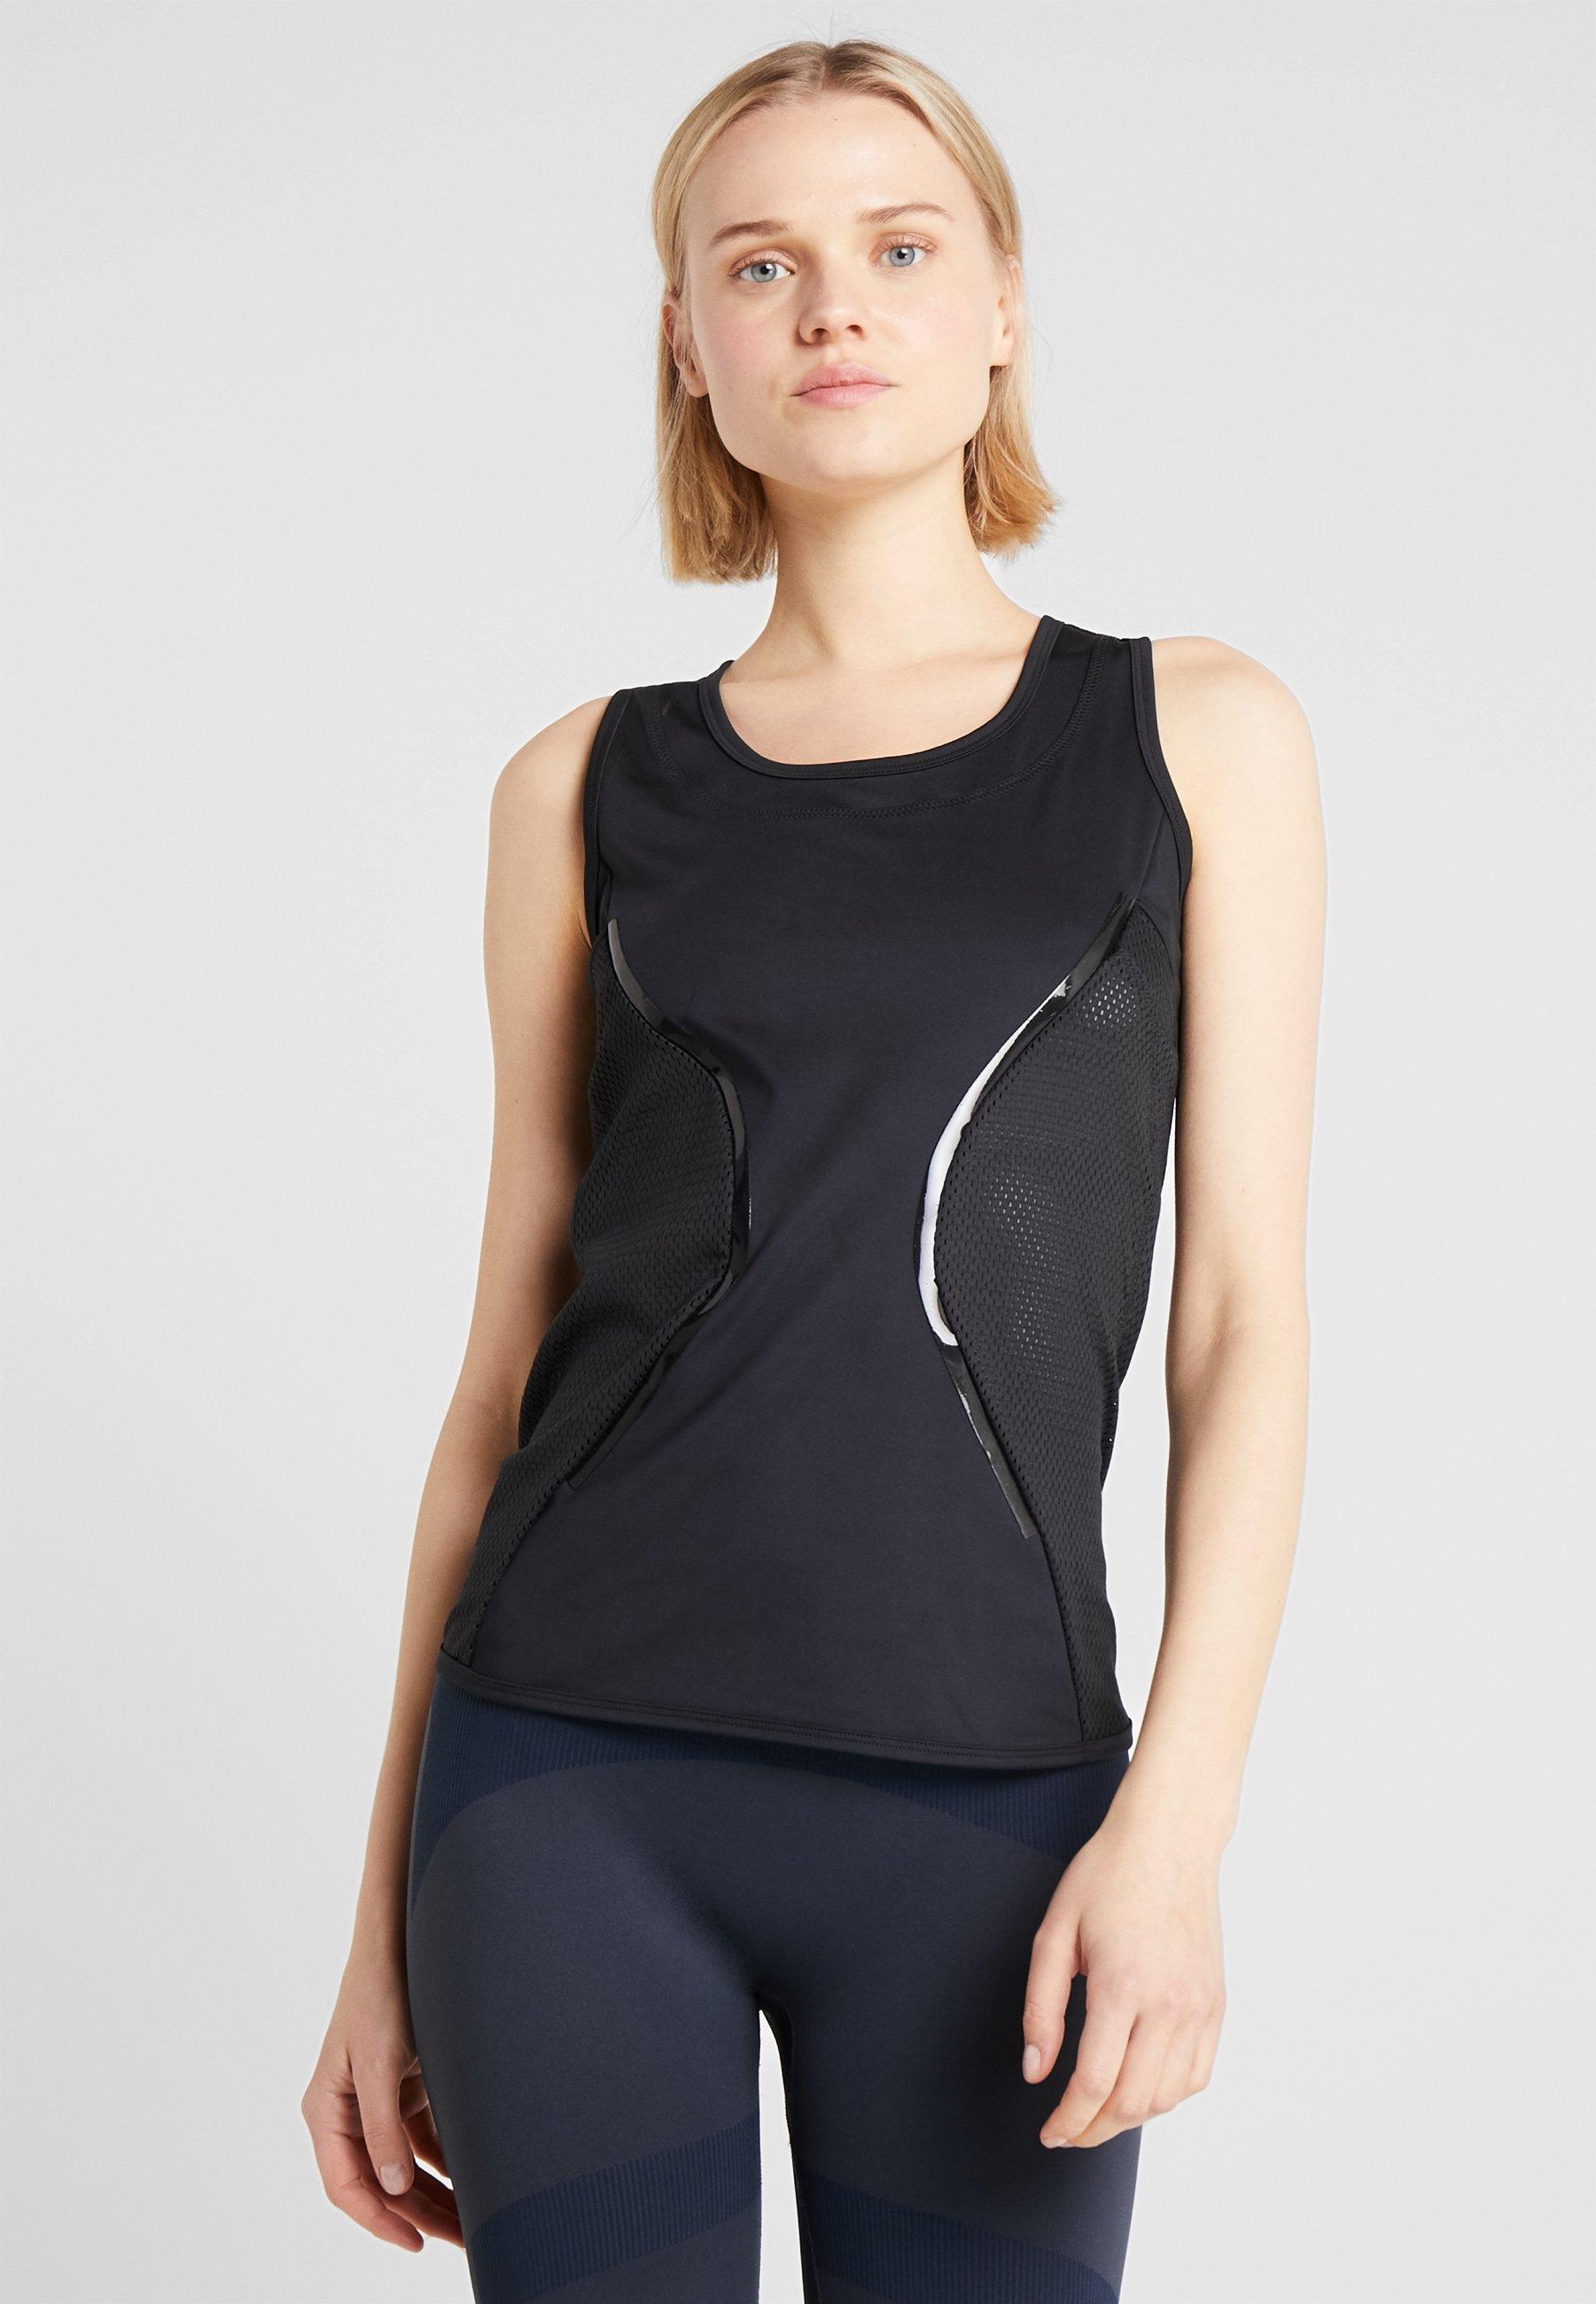 adidas by Stella McCartney VENTILATED CLIMALITE WORKOUT TANK - Top black